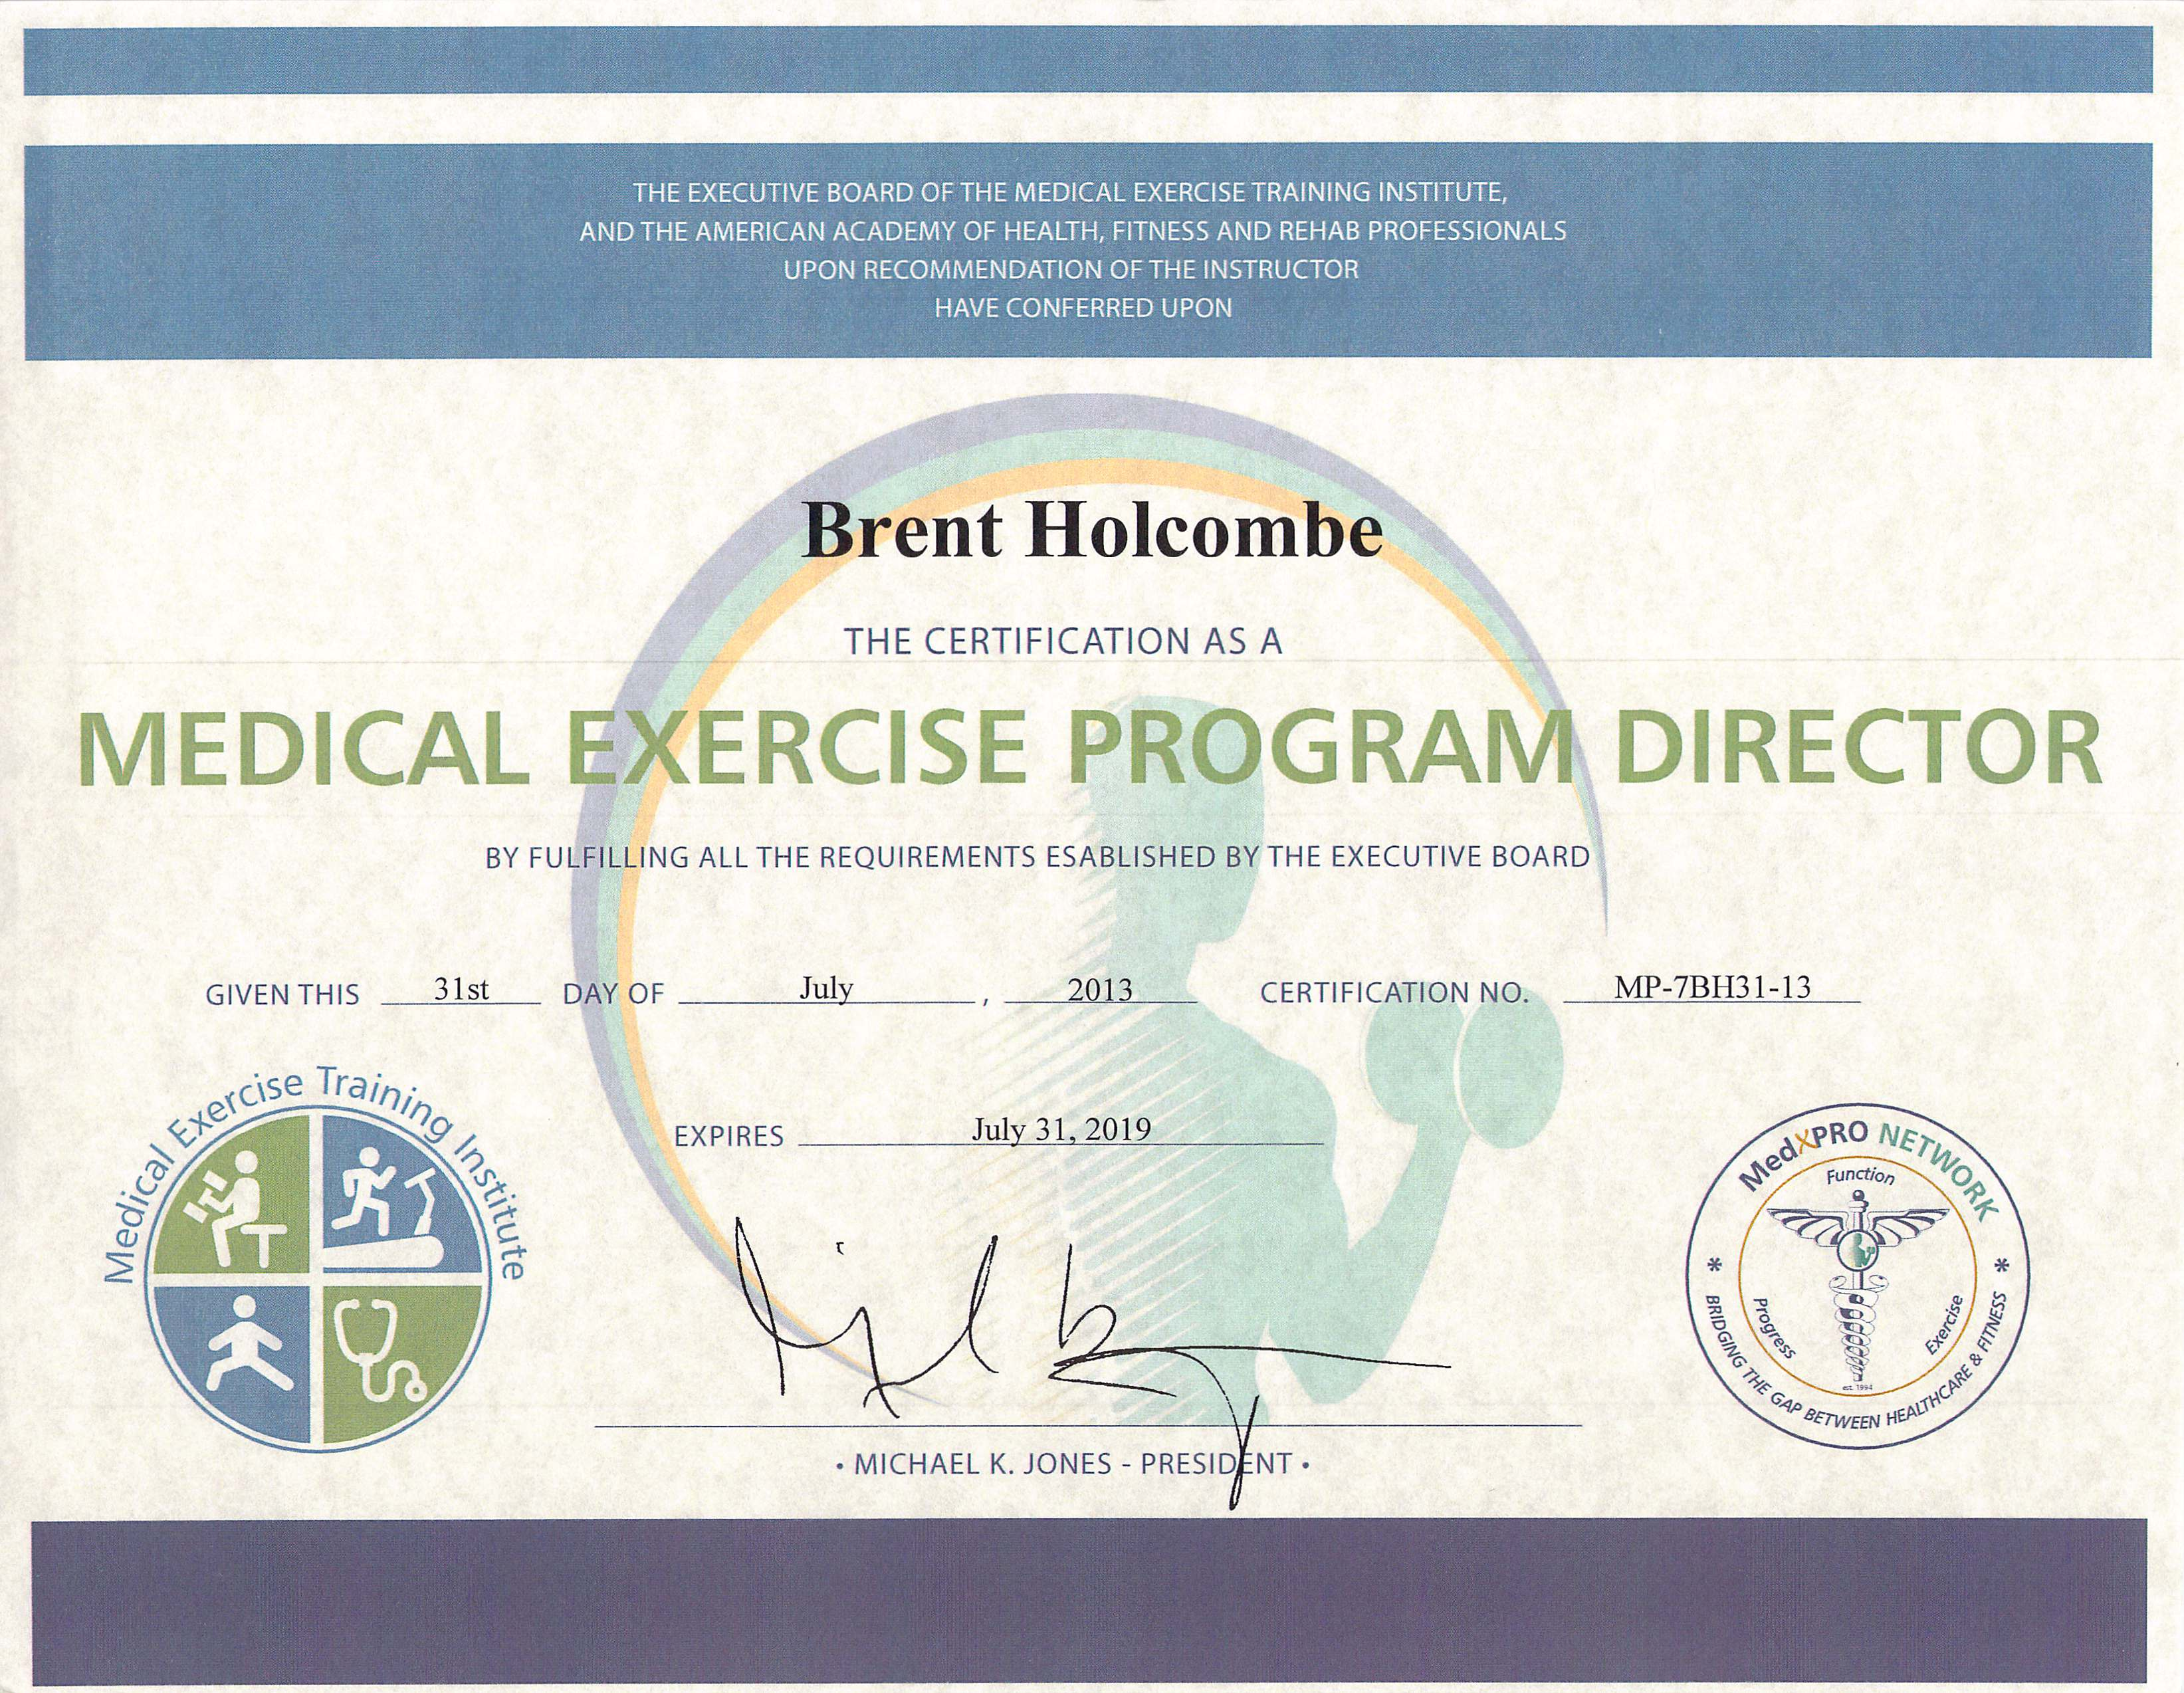 Medical Exercise Program Director